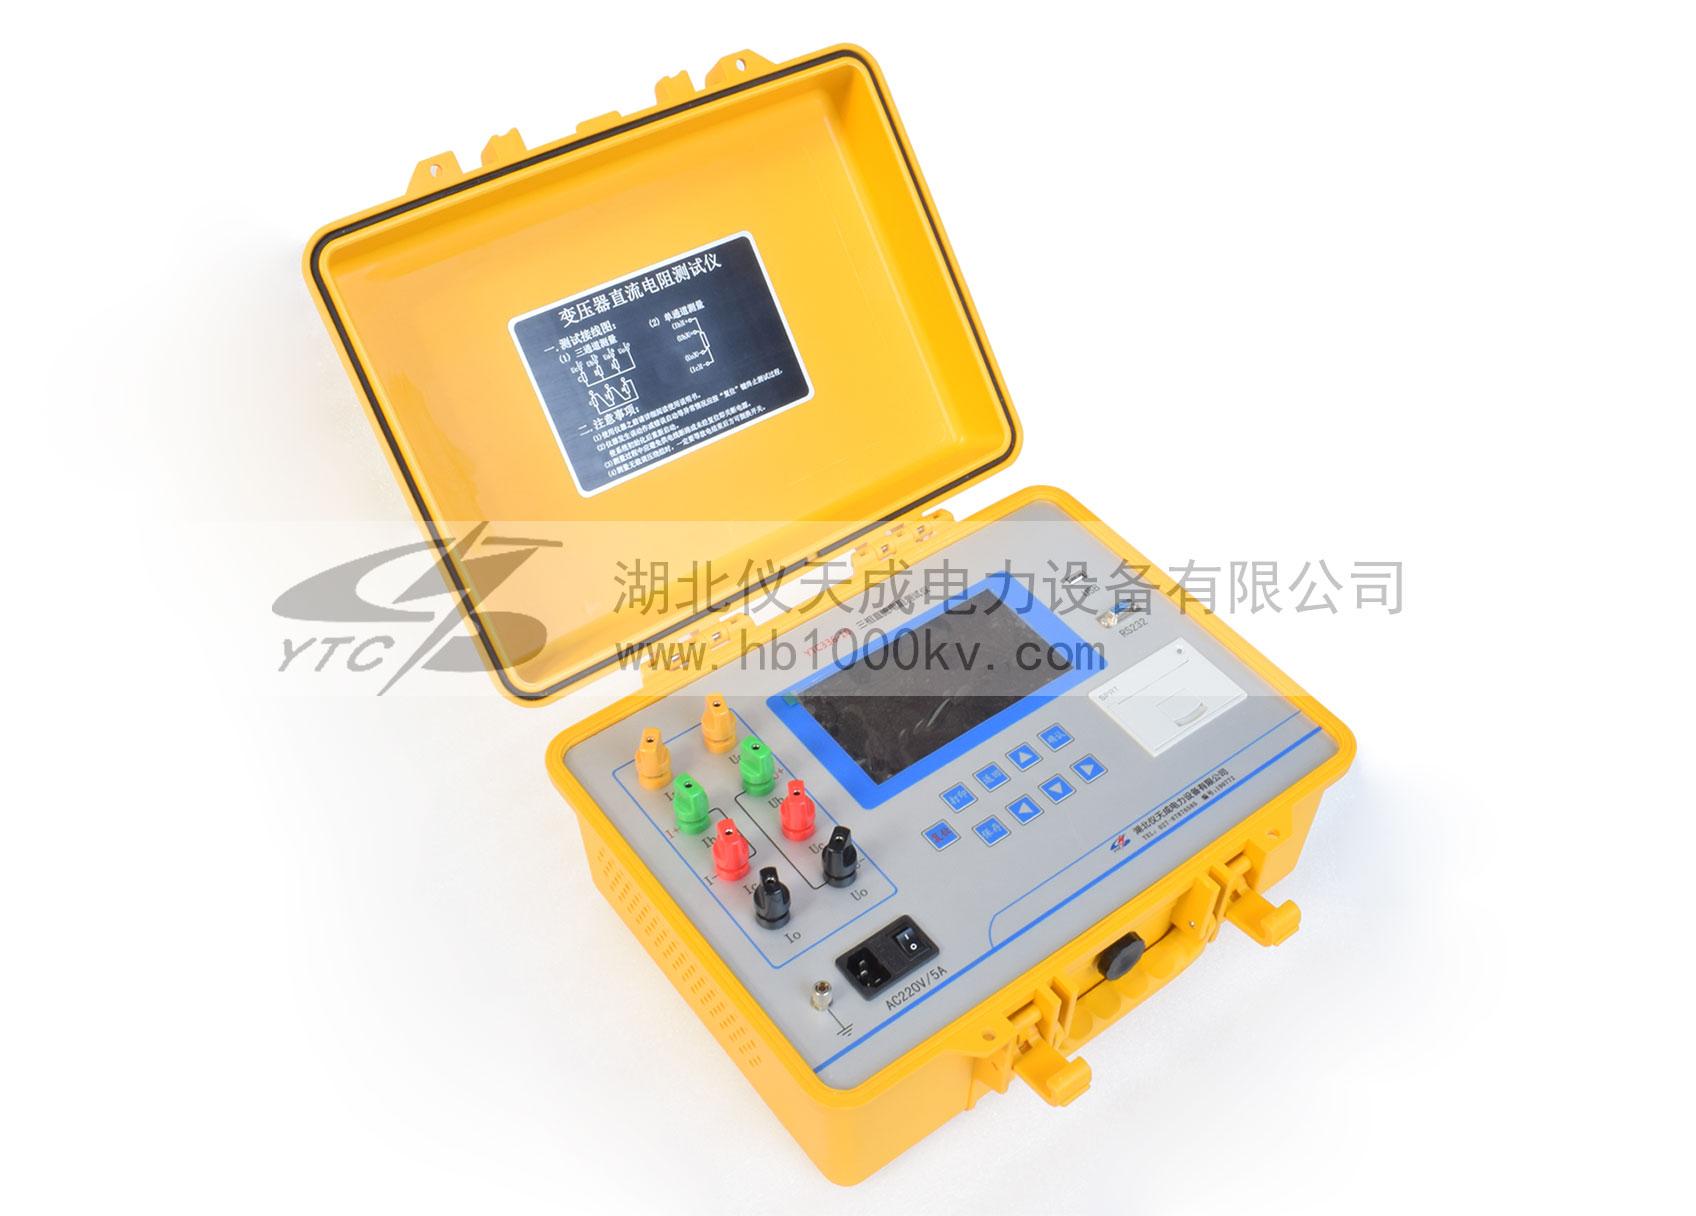 YTC336-10三相直流电阻测试仪